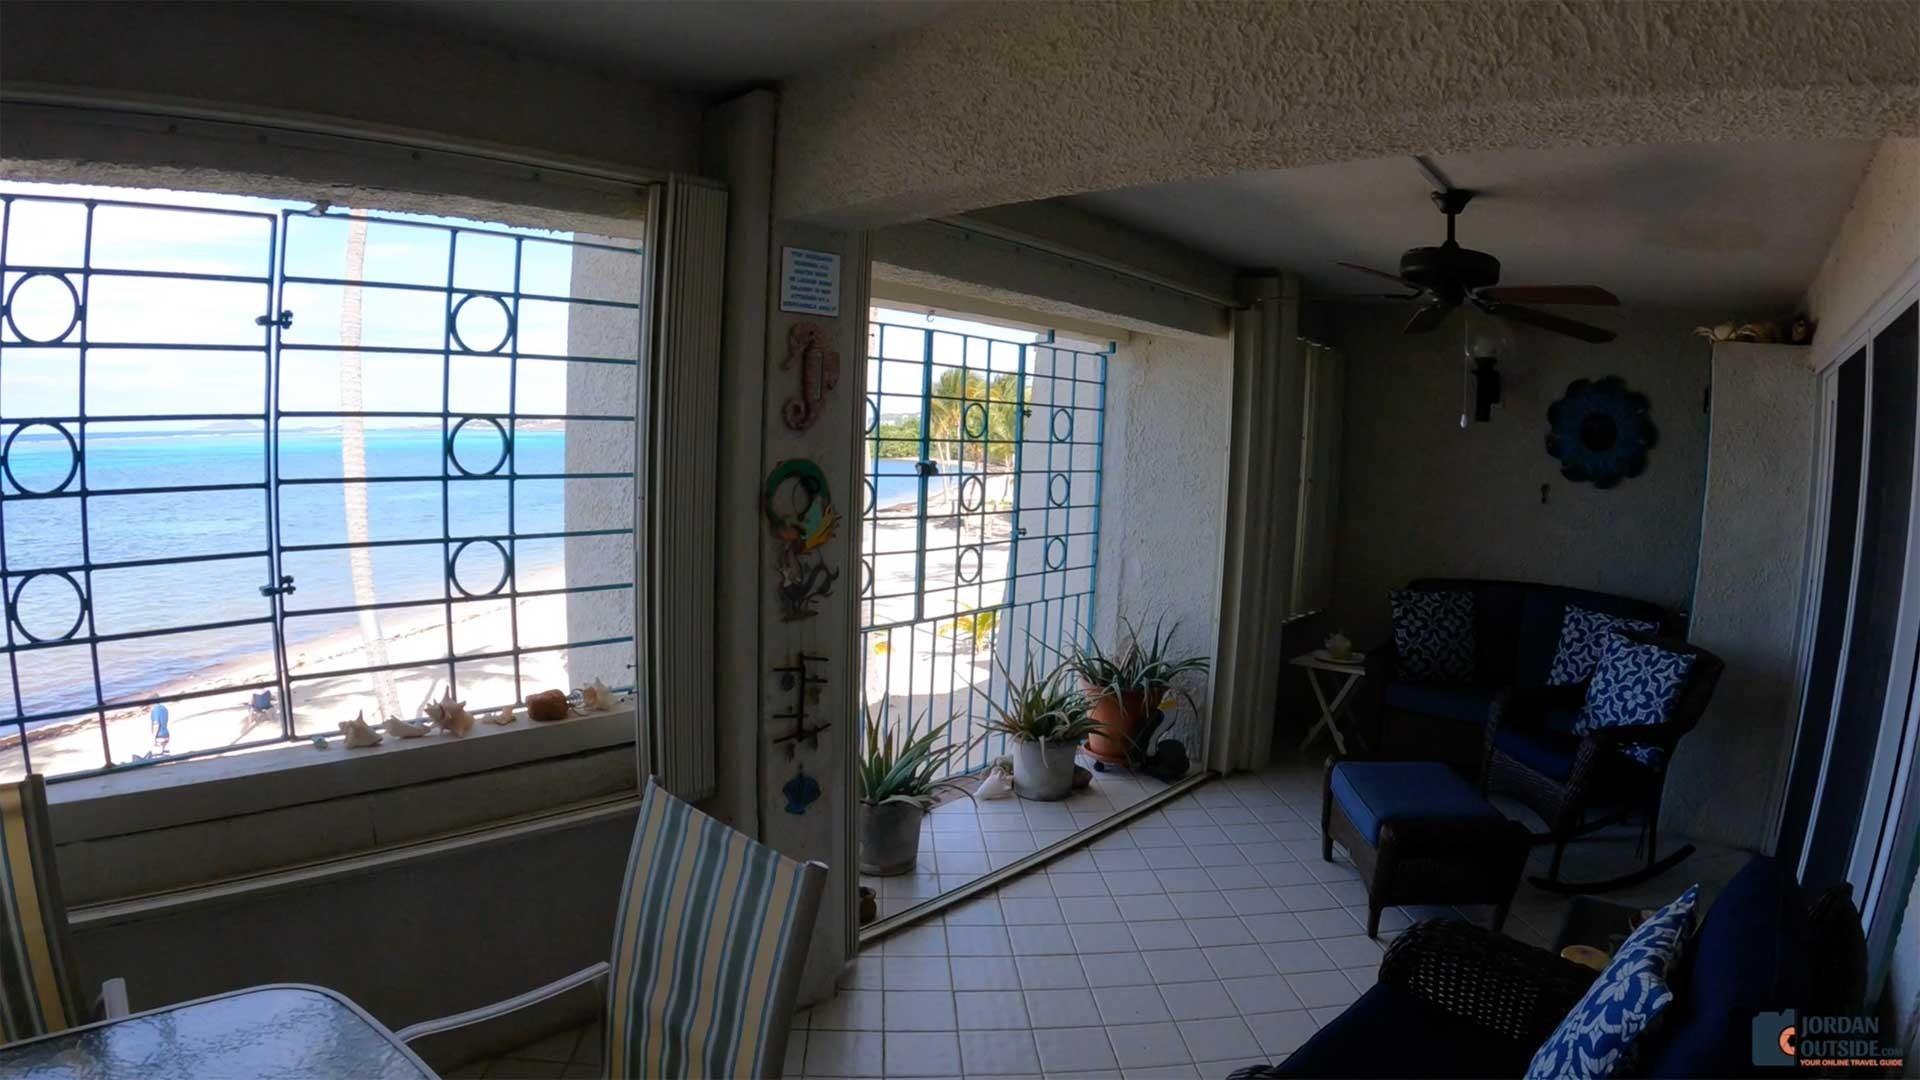 Balcony at Sugar Beach Condos Unit 207